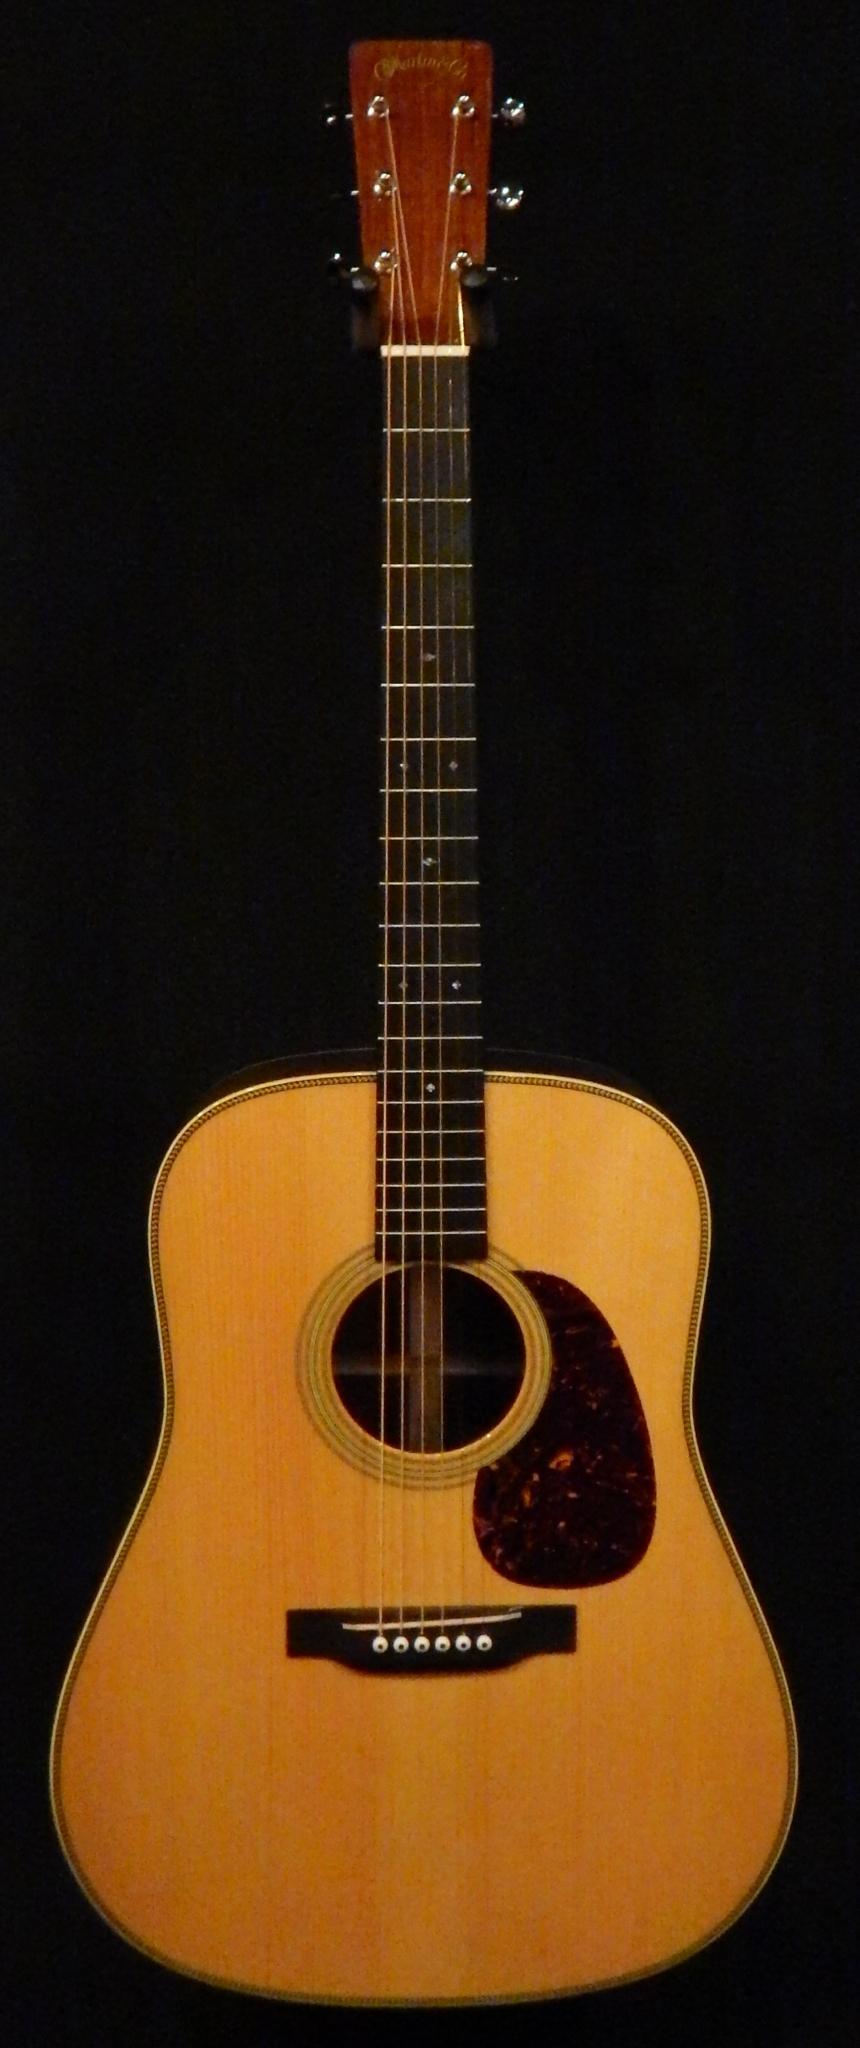 martin d 28 authentic 1941 adirondack madagascar rosewood used 2013 down home guitars. Black Bedroom Furniture Sets. Home Design Ideas